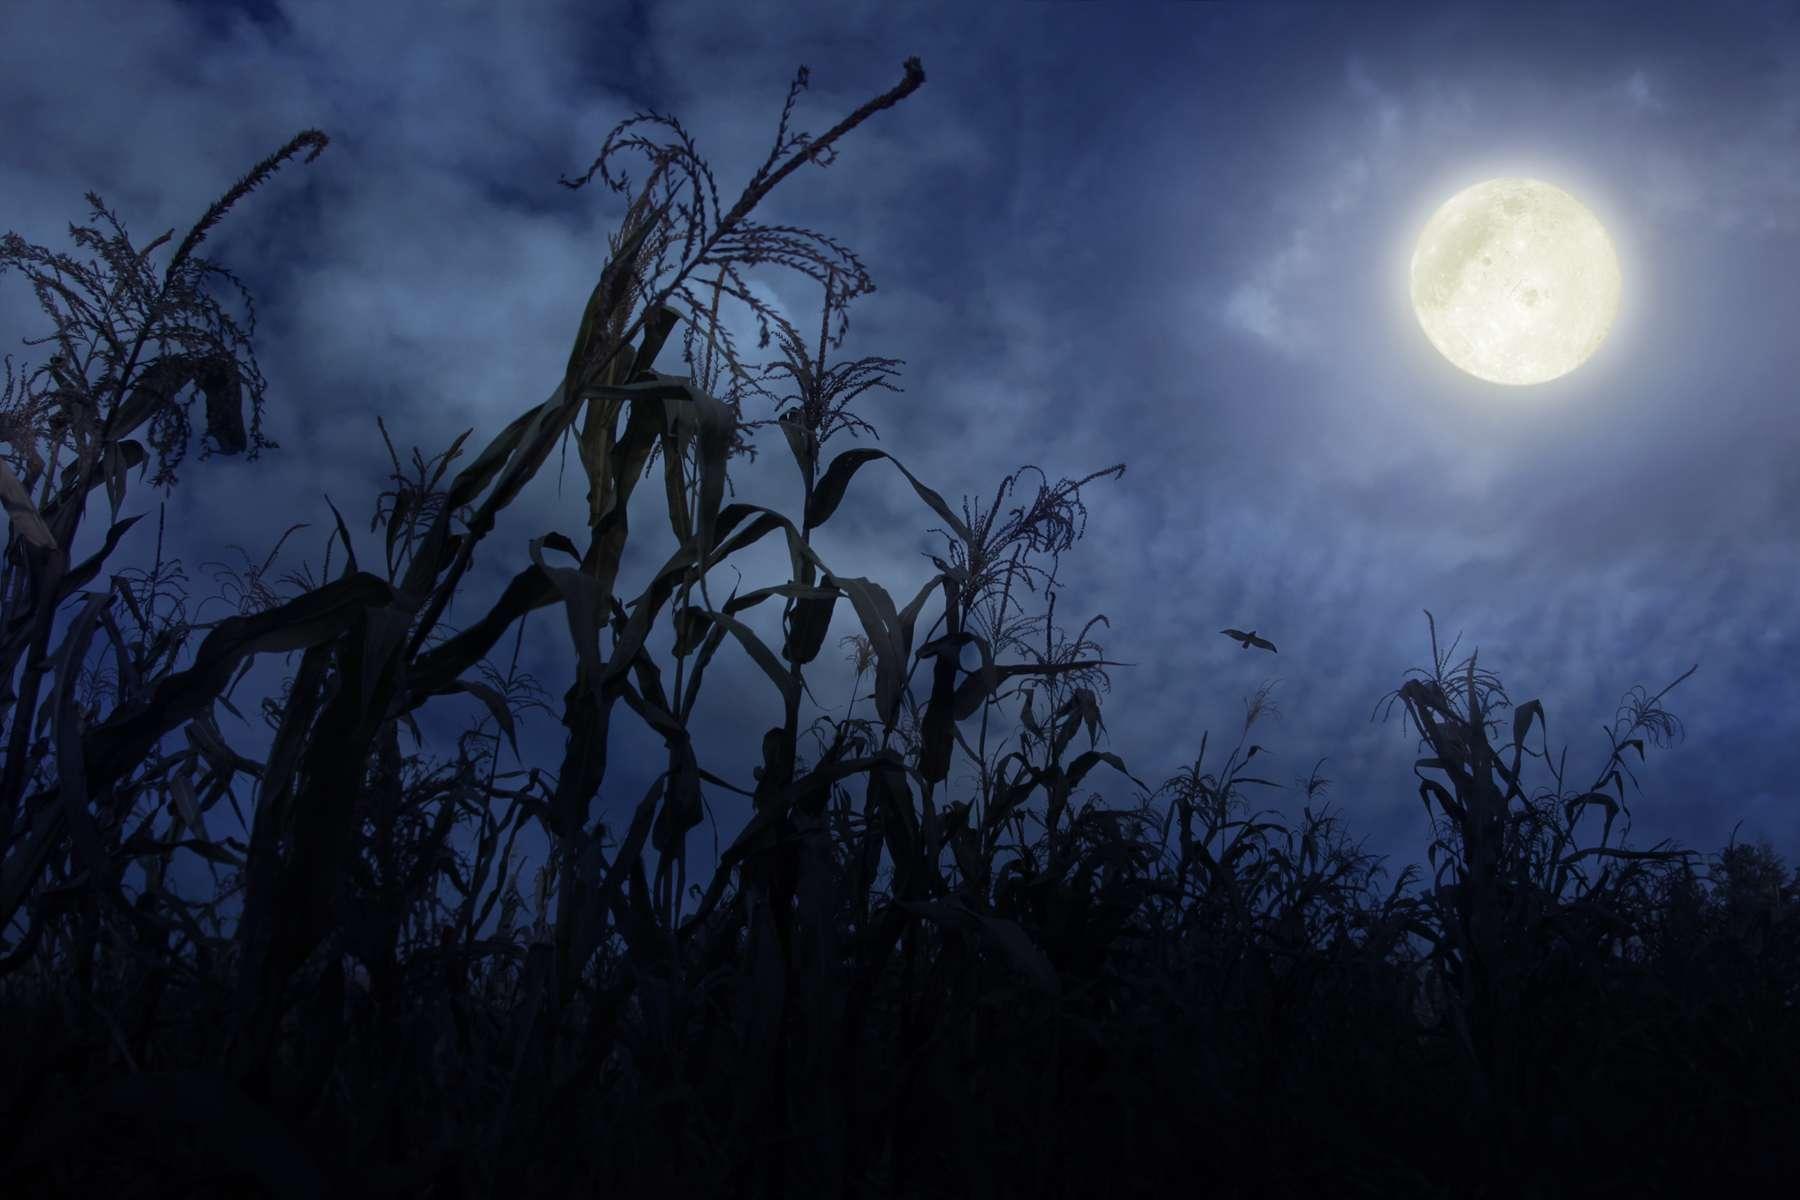 Cornfield at Night